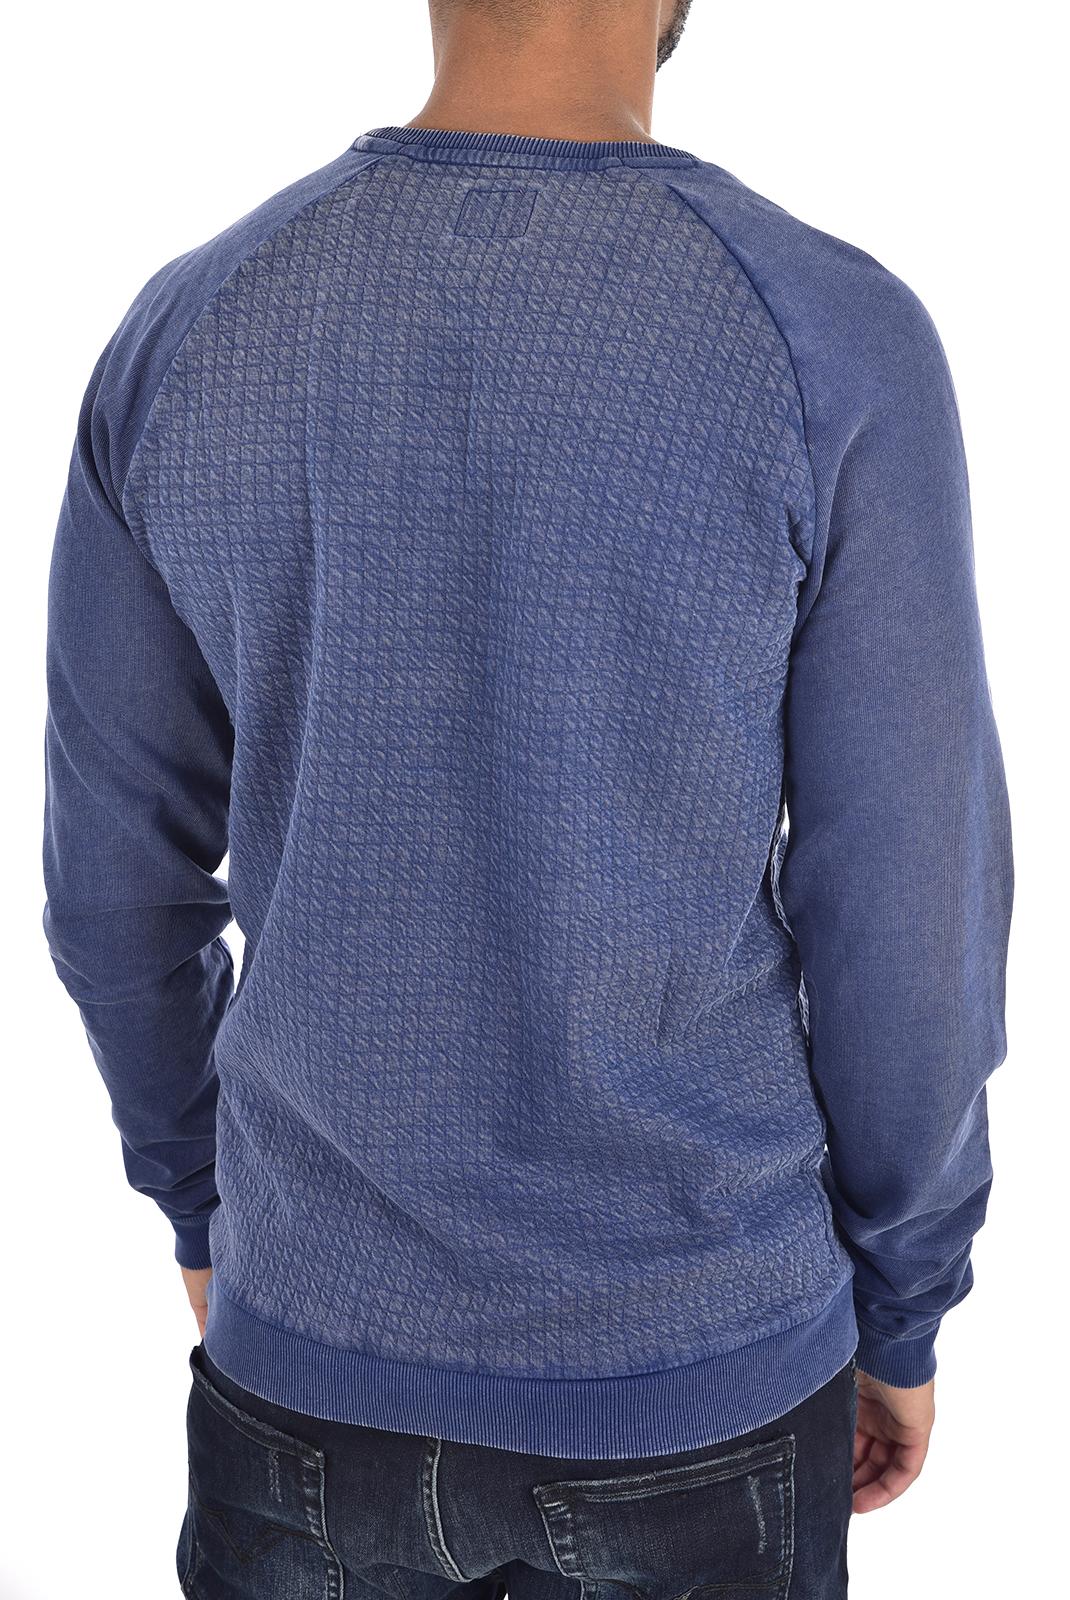 HOMME  Guess jeans M64Q02K6YA9 G720 BLUE NAVY